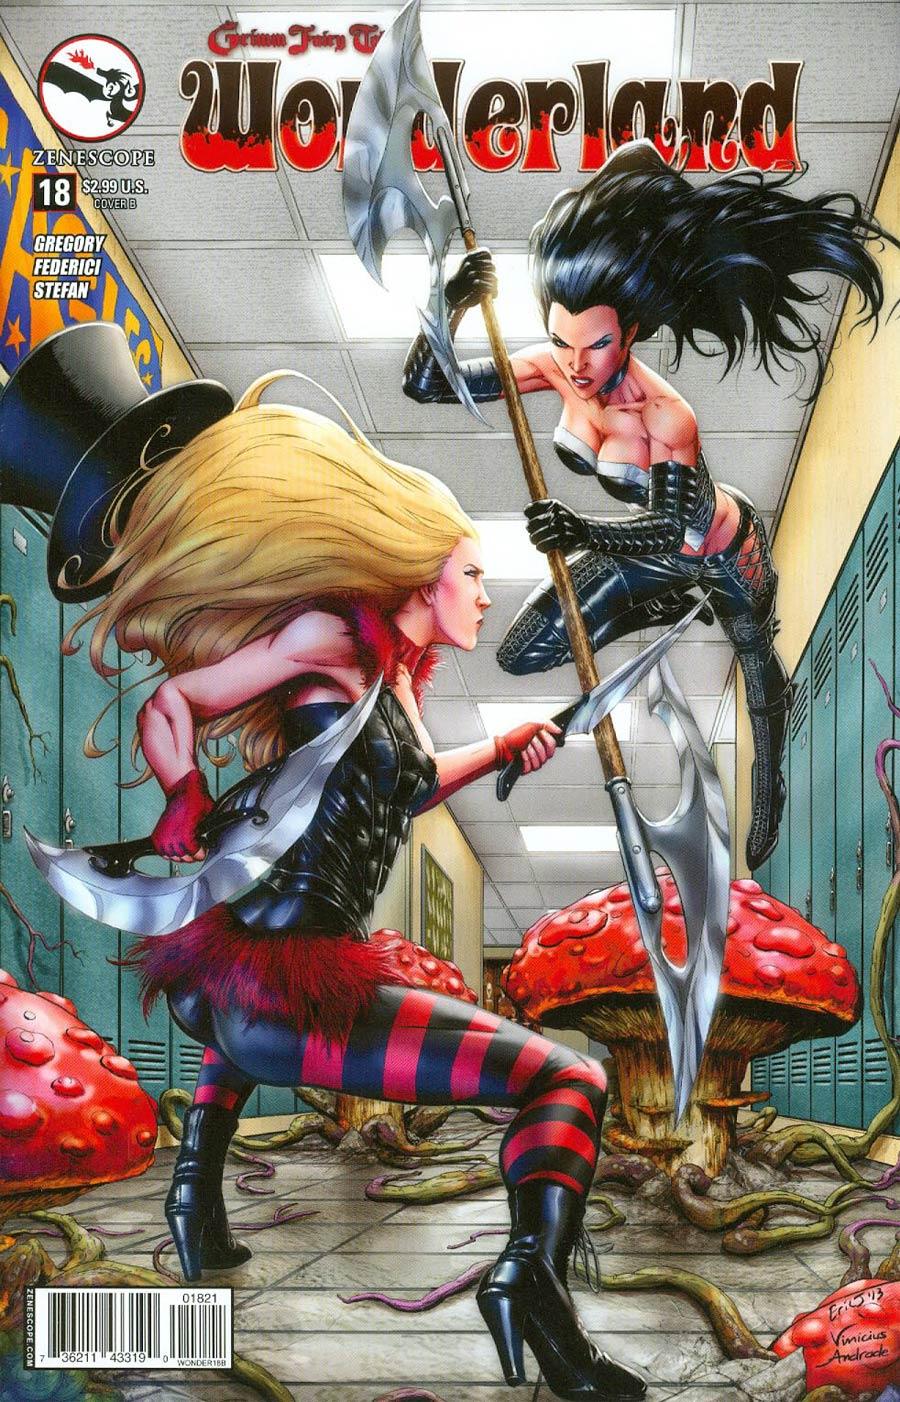 Grimm Fairy Tales Presents Wonderland Vol 2 #18 Cover B Eric J